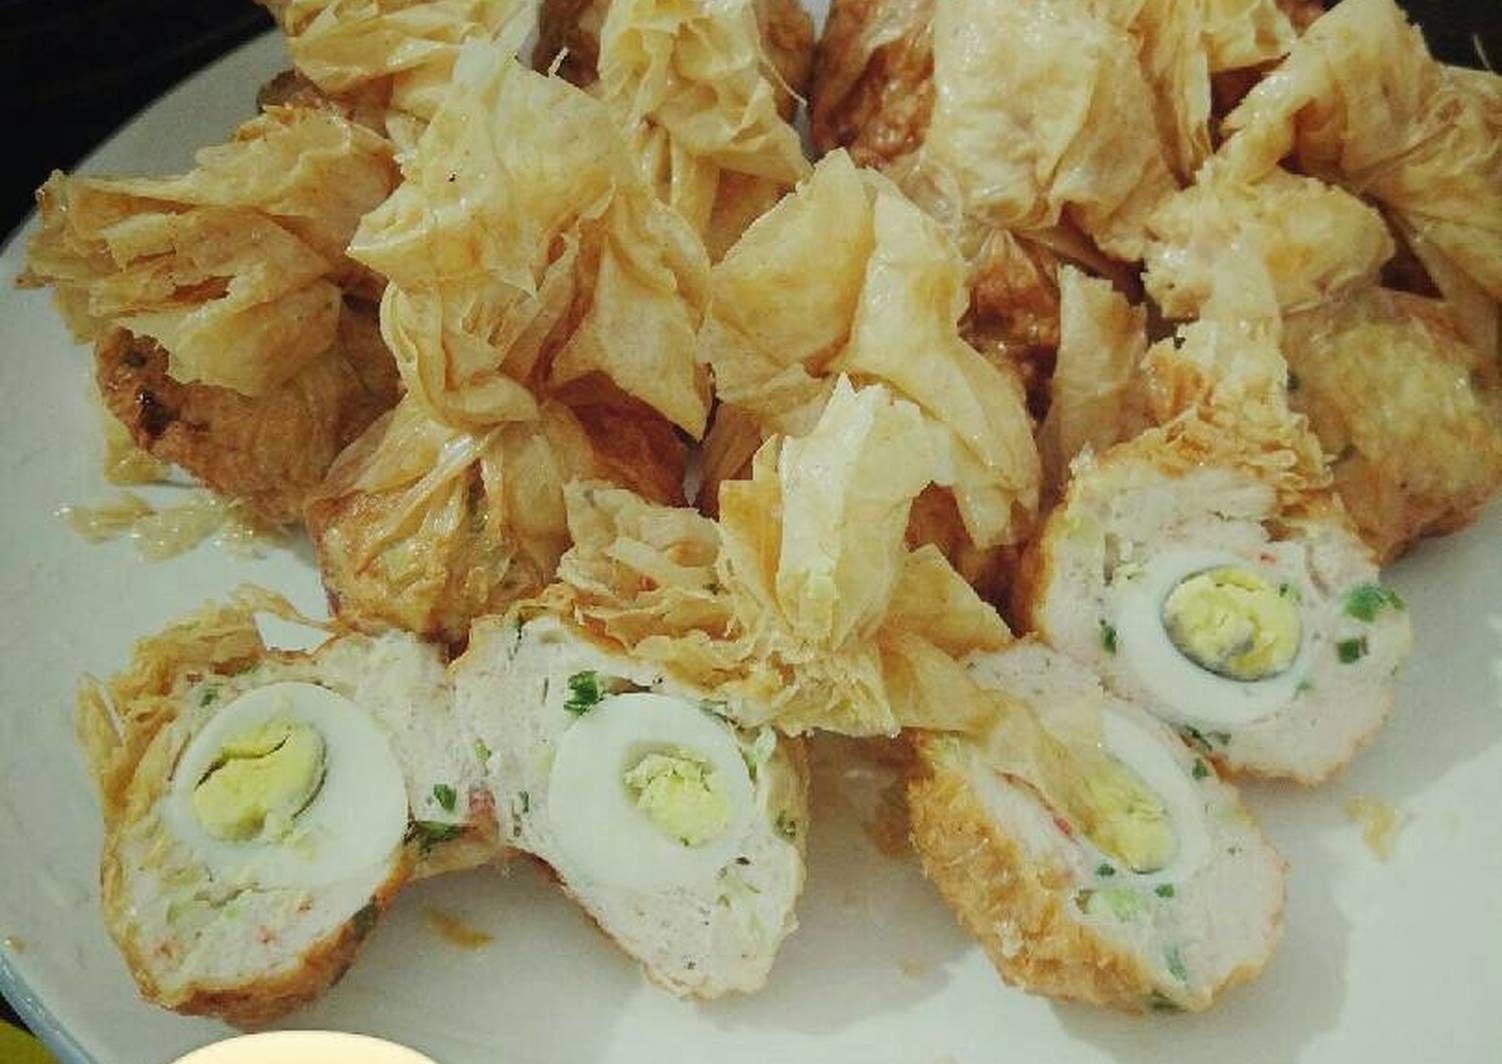 Gorengan Sederhana Seperti Ekado Yang Dapat Anda Buat Sendiri Di Rumah Dengan Resep Dan Cara Yang Sederhana Resep Resep Masakan Resep Makanan Cina